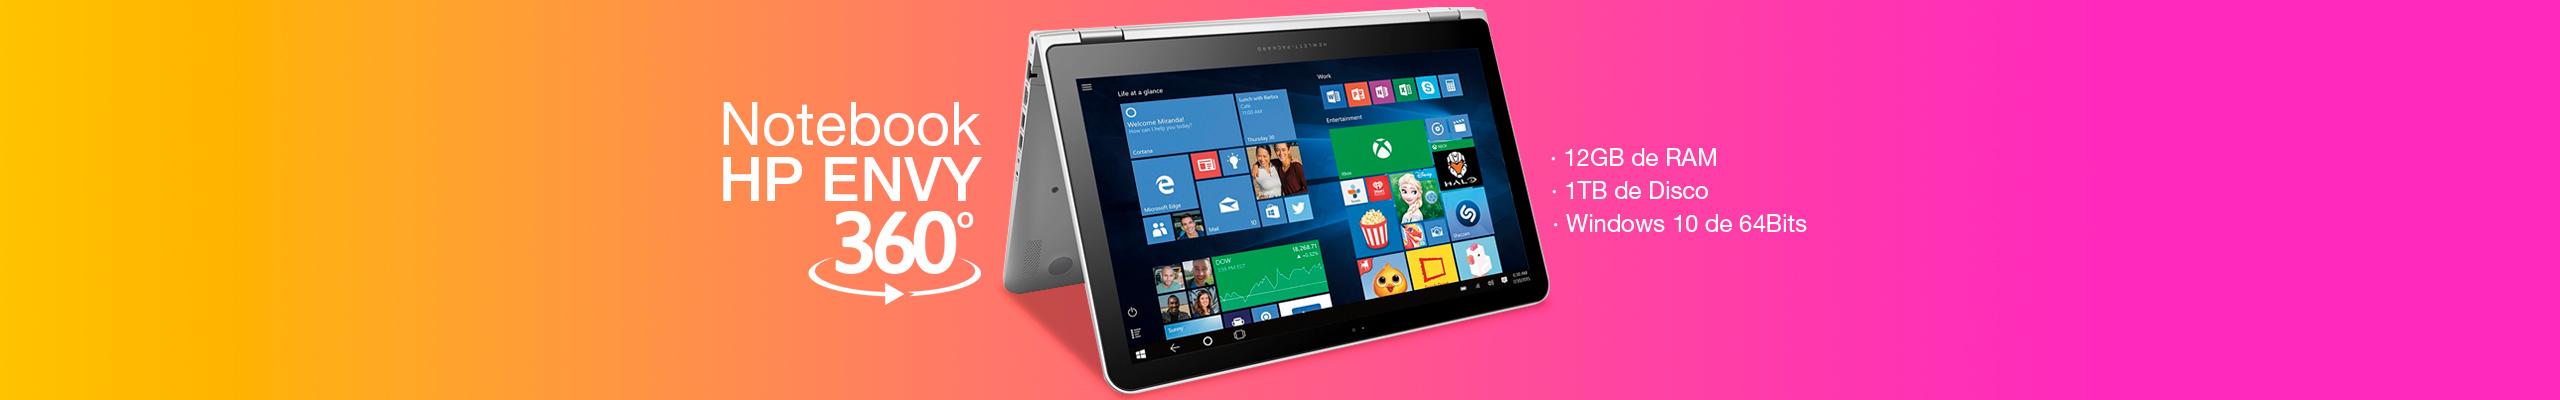 Notebook HP ENVY 360°